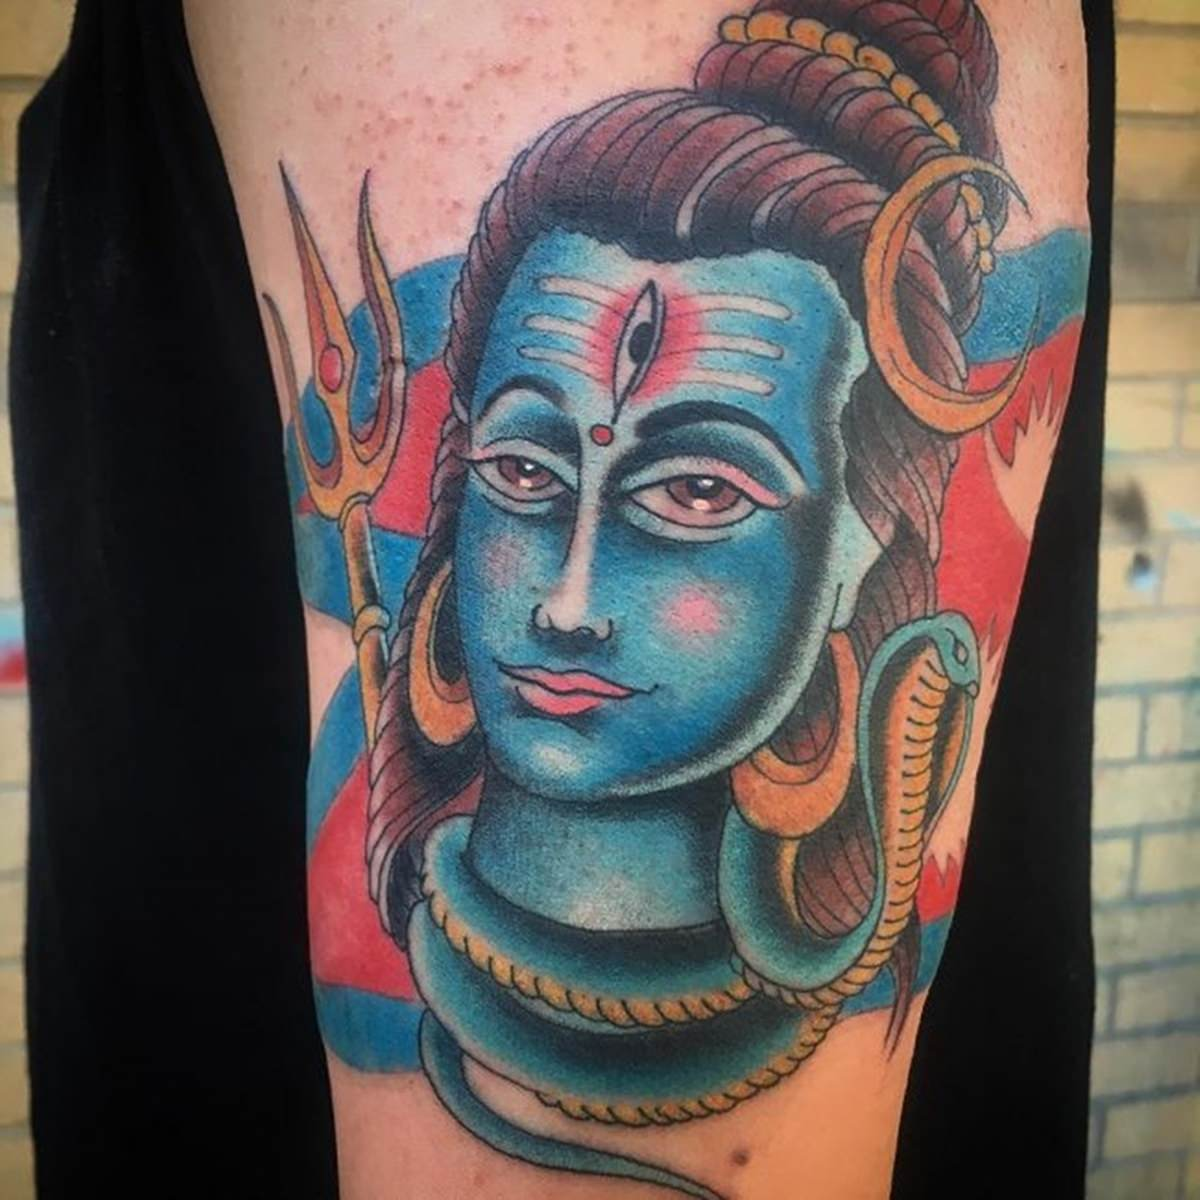 Tatuagem feminina indiana de Shiva